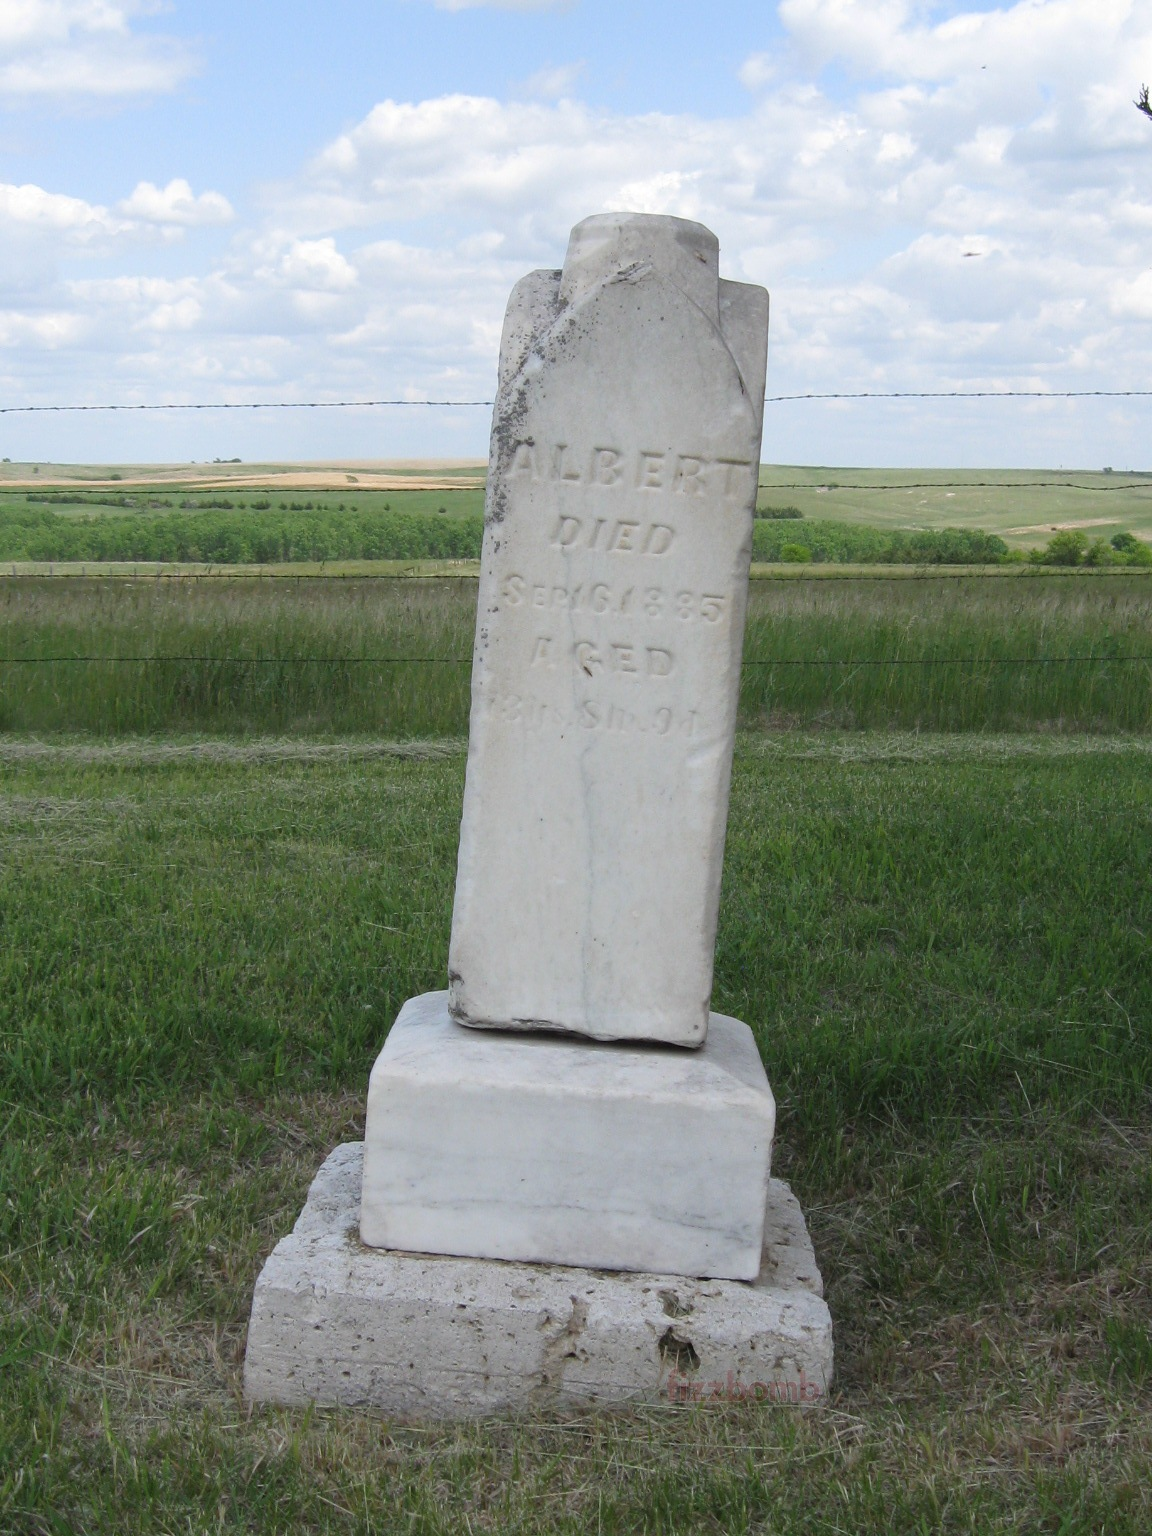 Albert Cope's grave marker